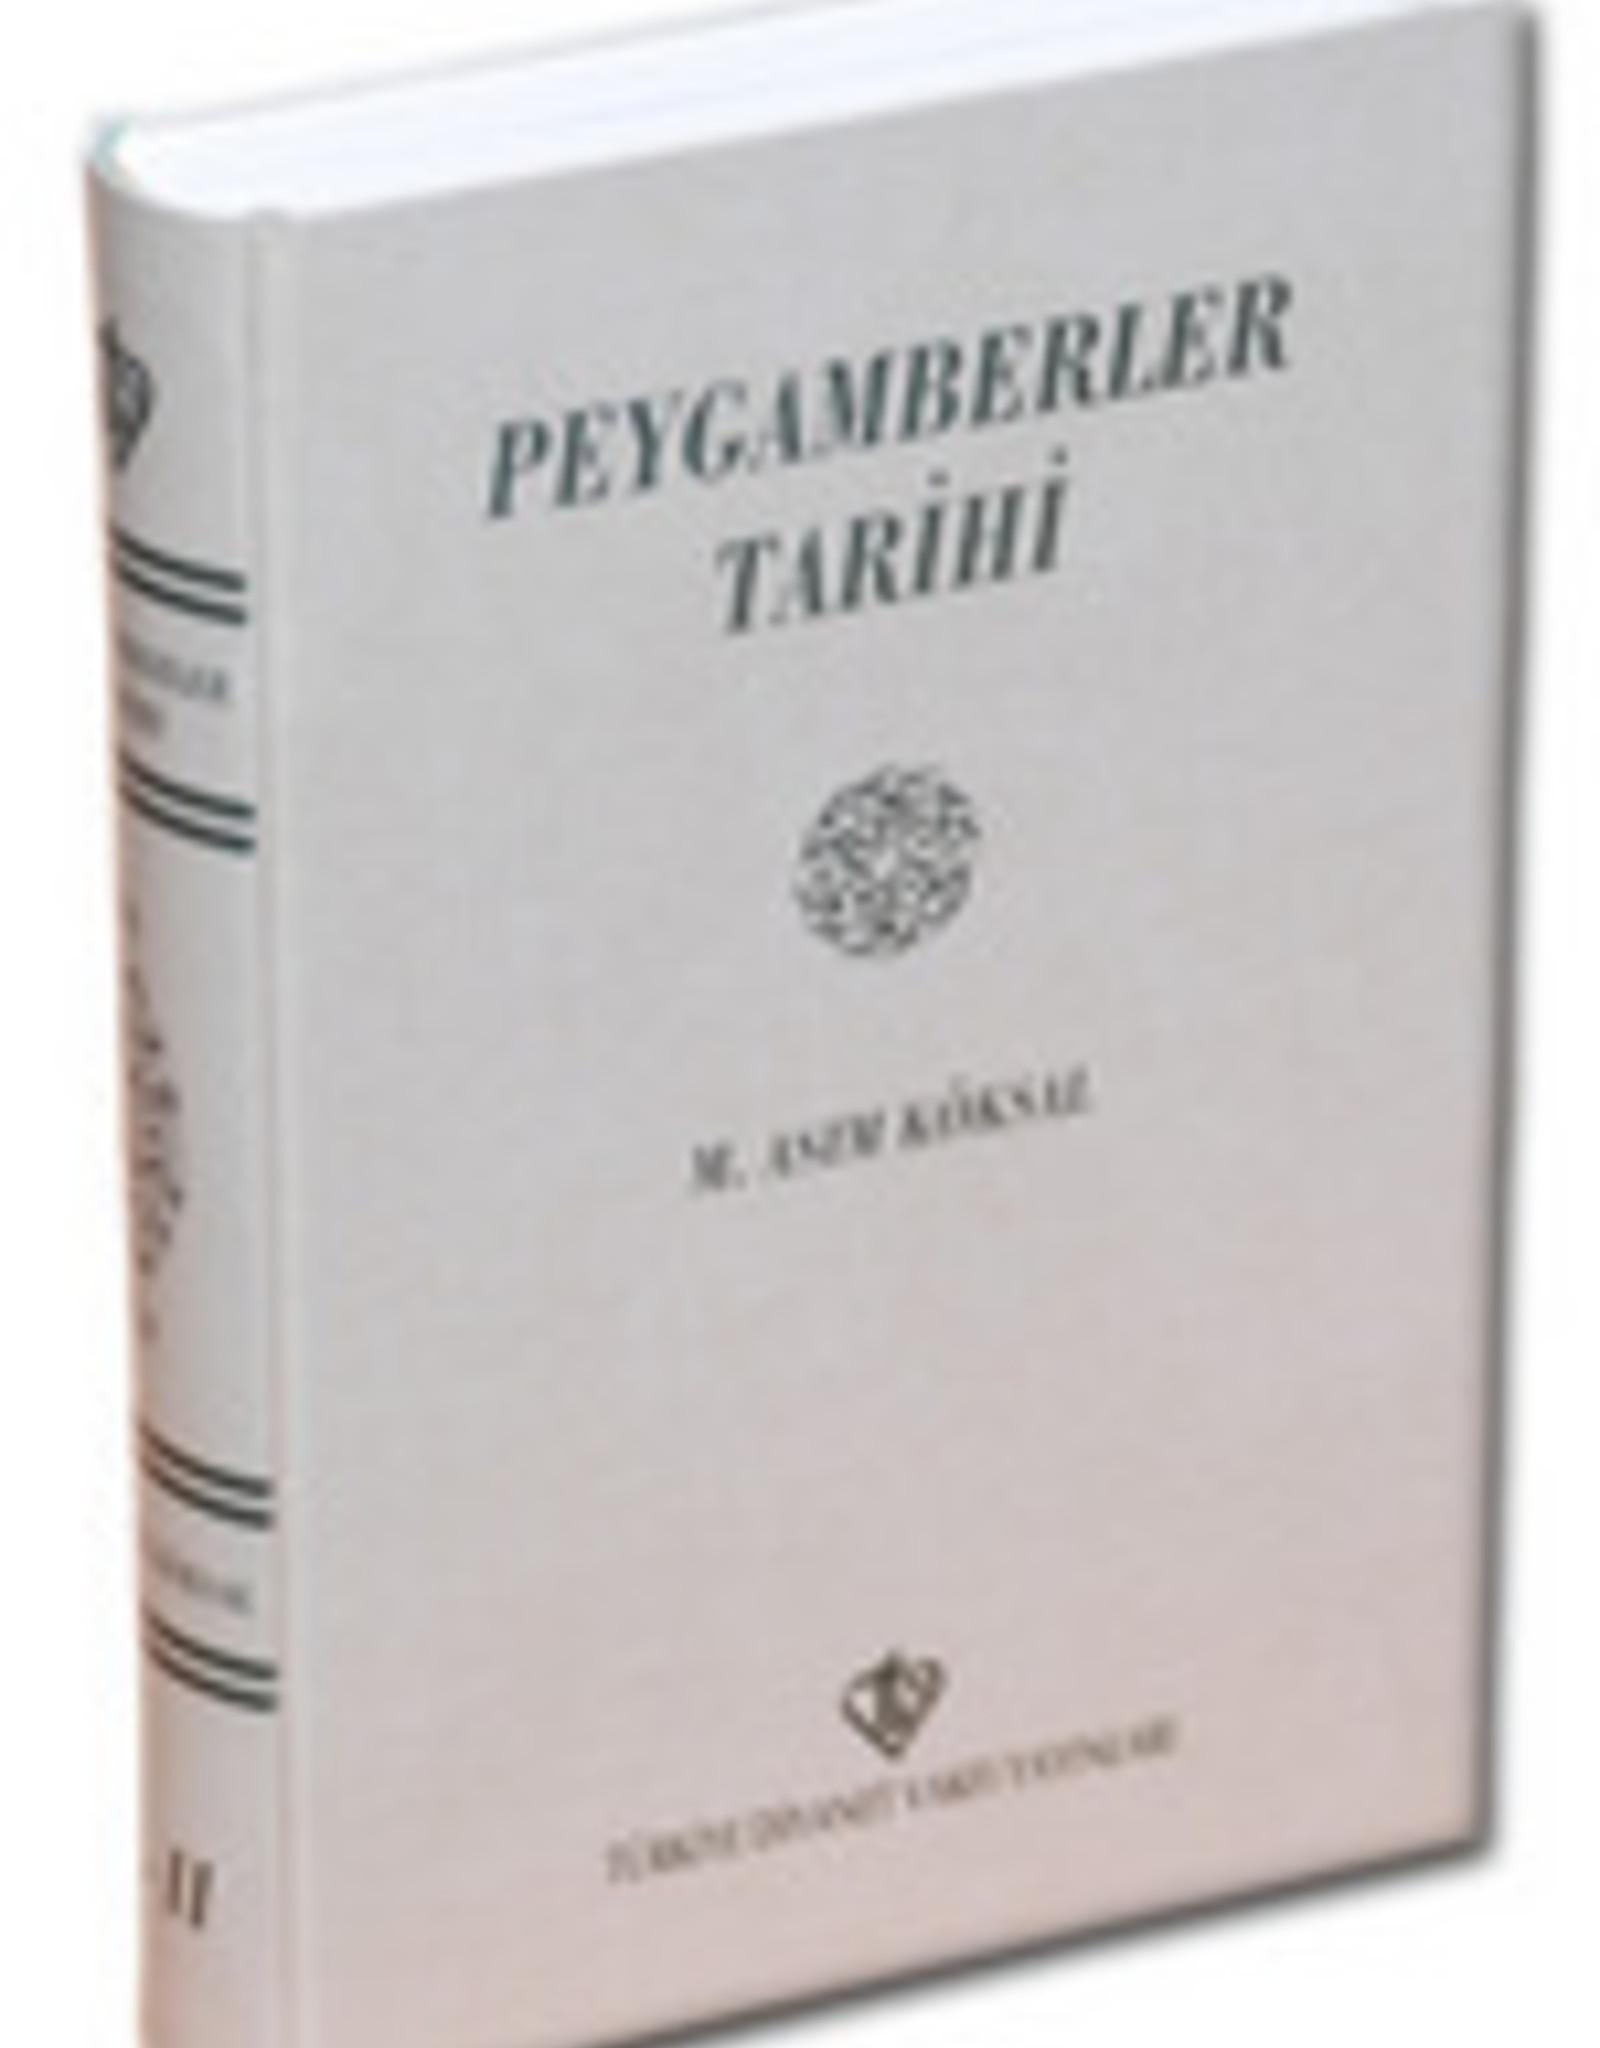 Peygamberler Tarihi TDV